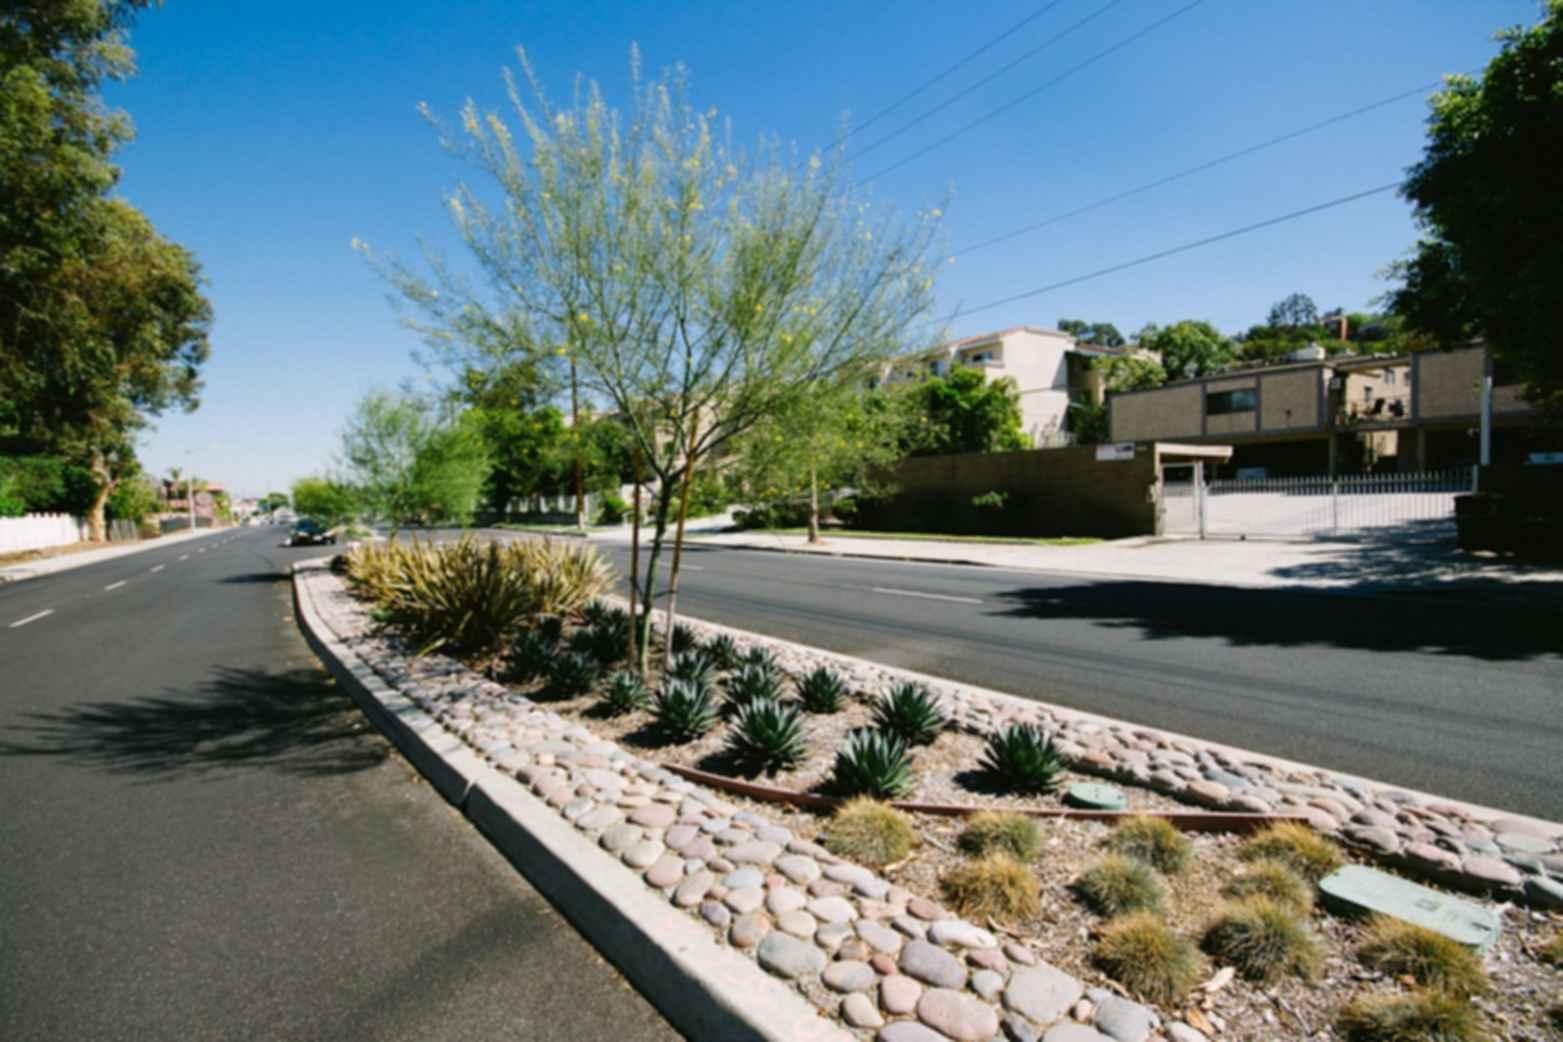 Public Spaces - Road